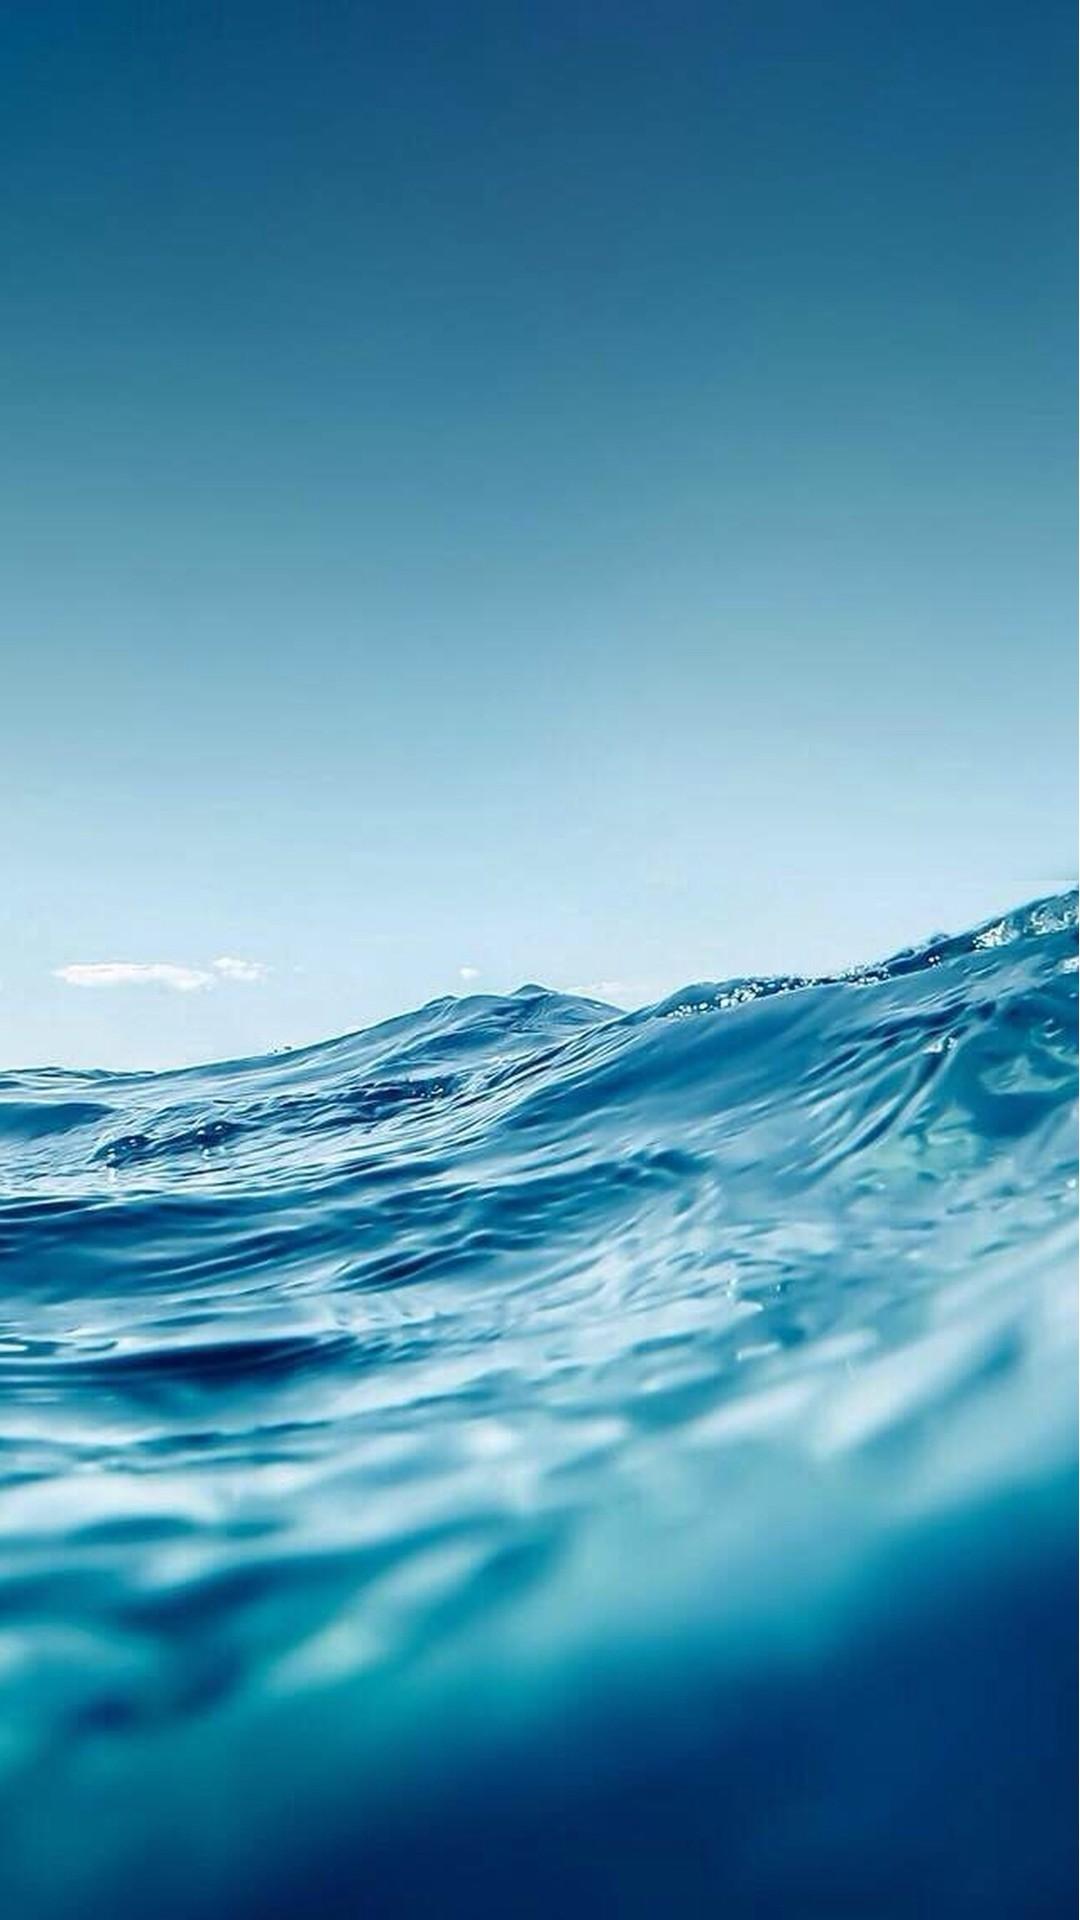 Blue Ocean Wallpaper 75 Images